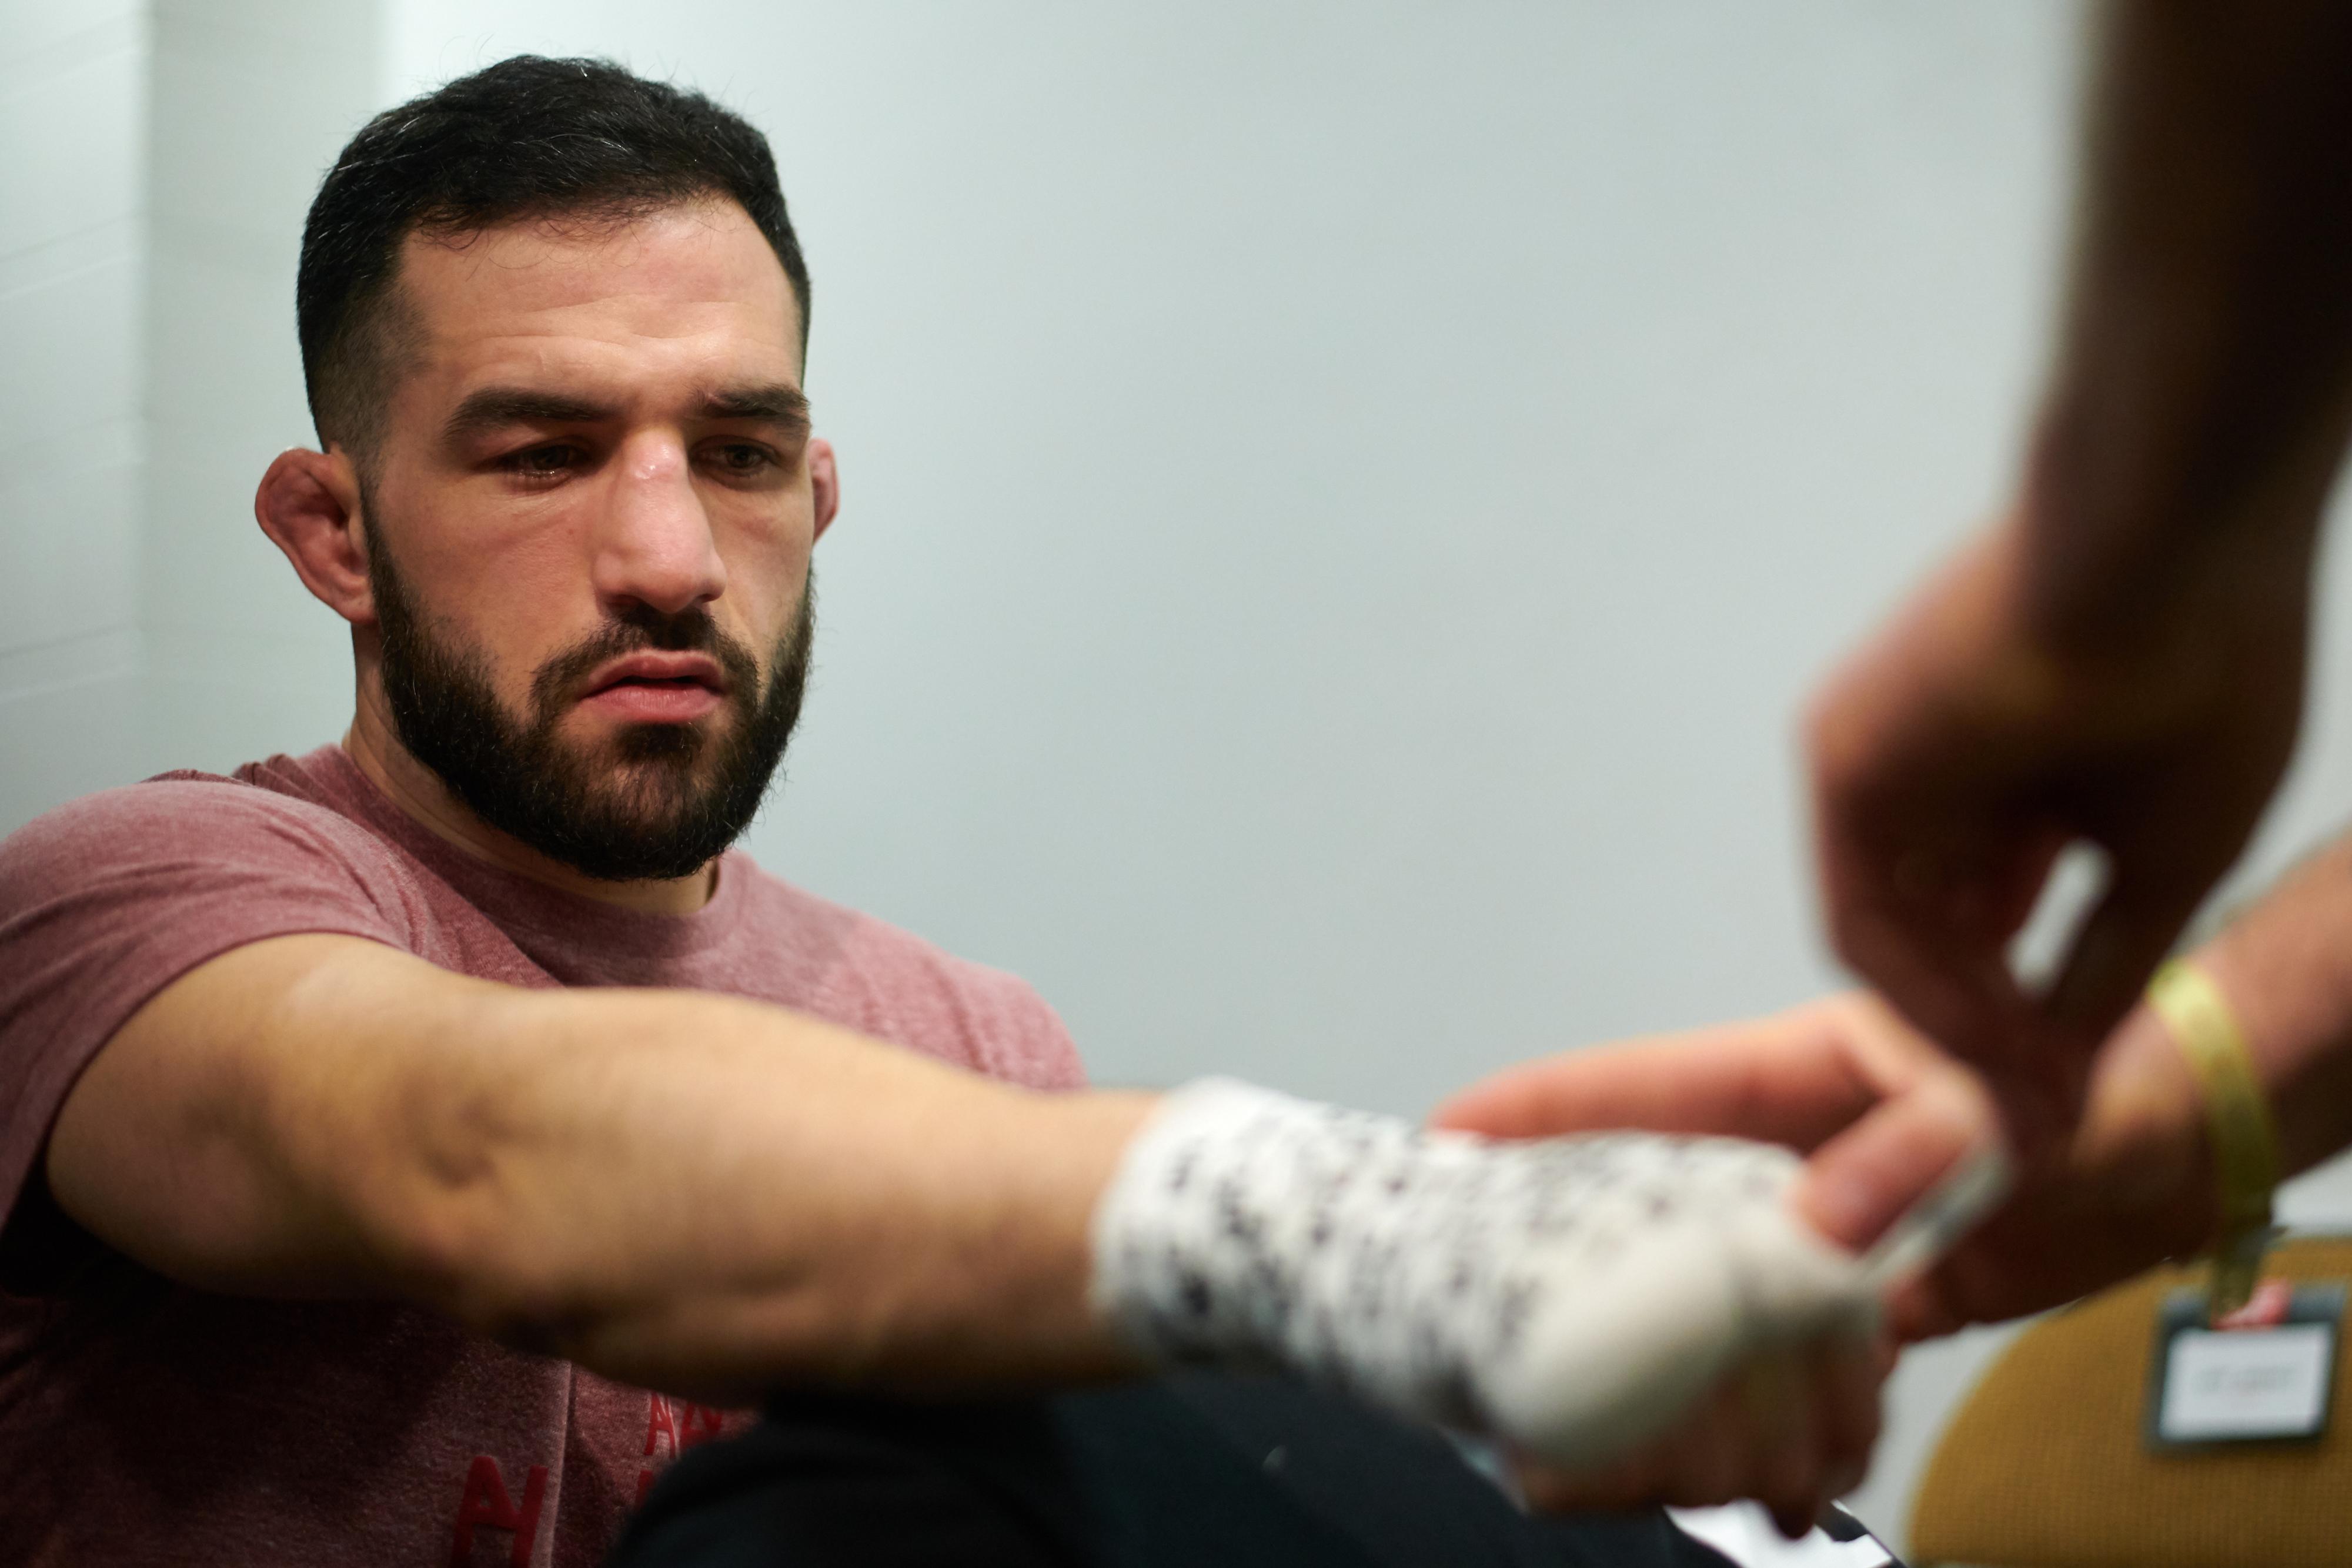 UFC Picks: Gordon By KO As Morets Chin Won't Hold Up